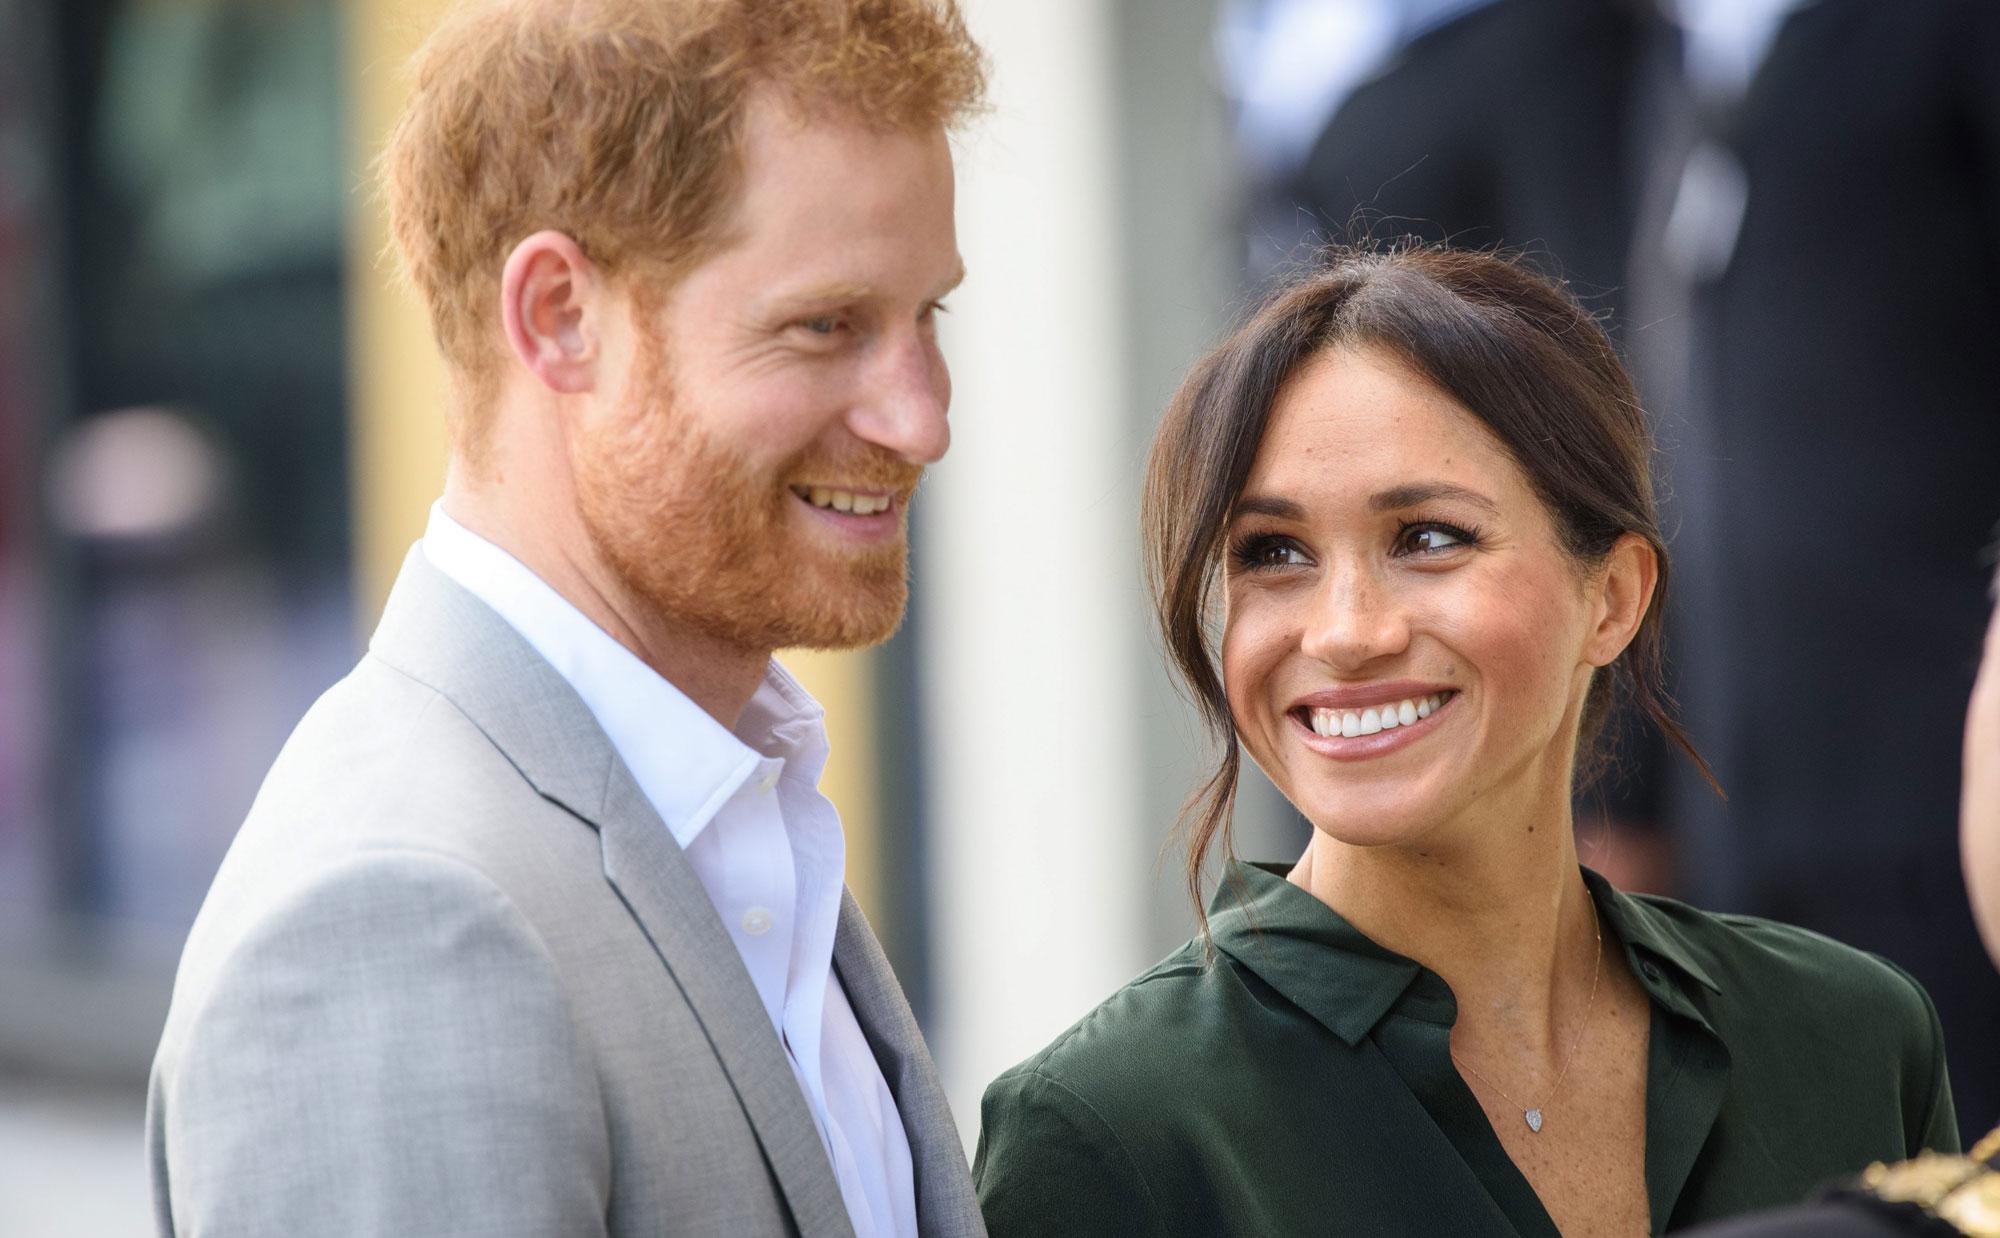 prince harry meghan markle expecting their 1st child in spring prince harry meghan markle expecting their 1st child in spring